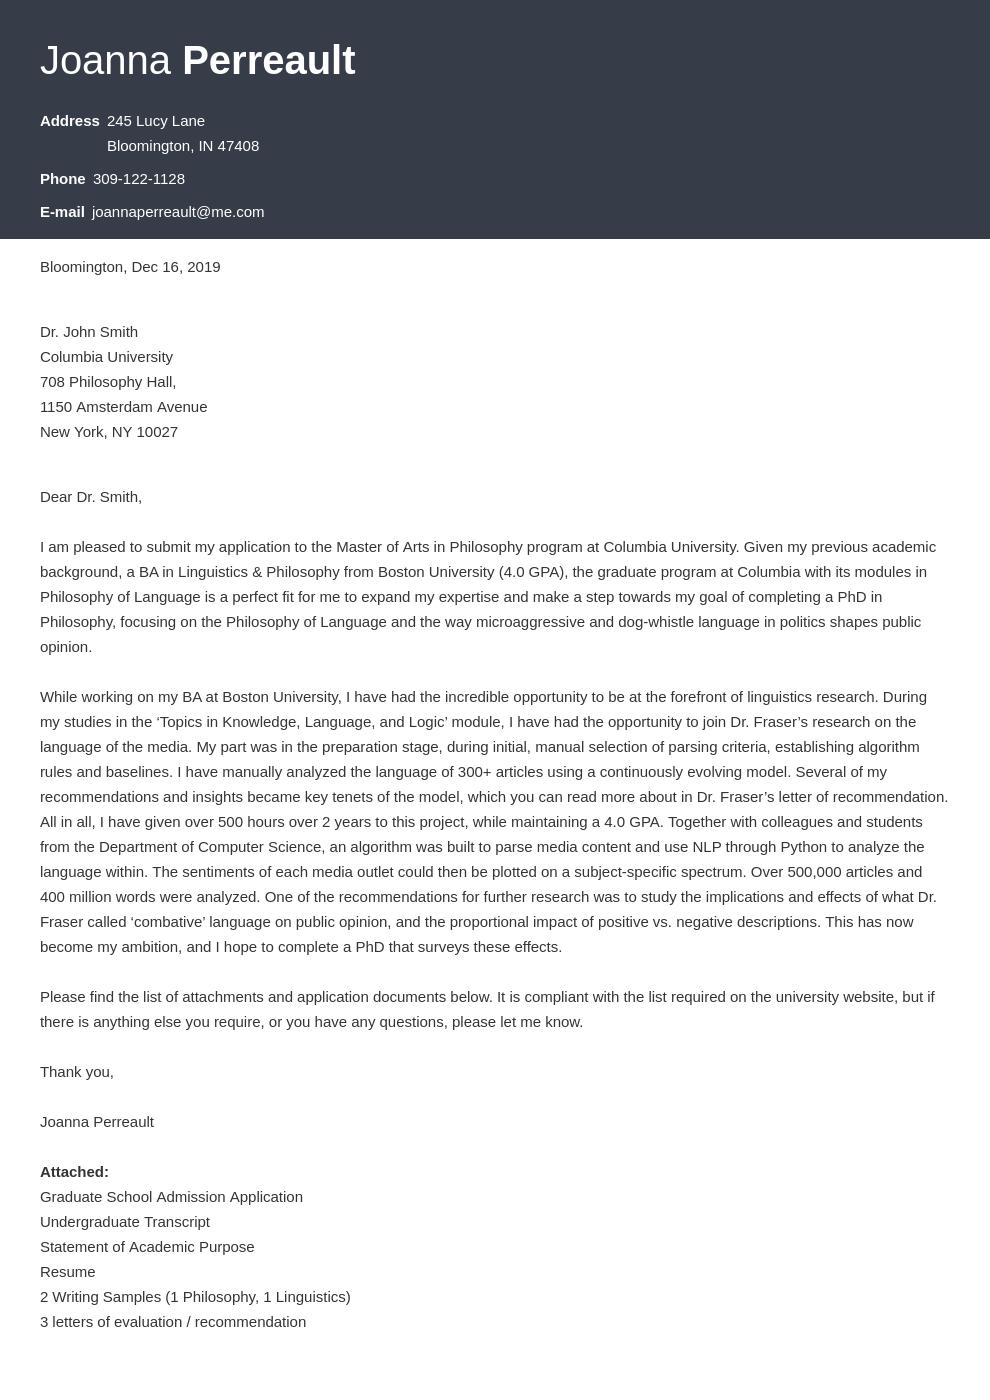 cover letter examples graduate school template diamond uk